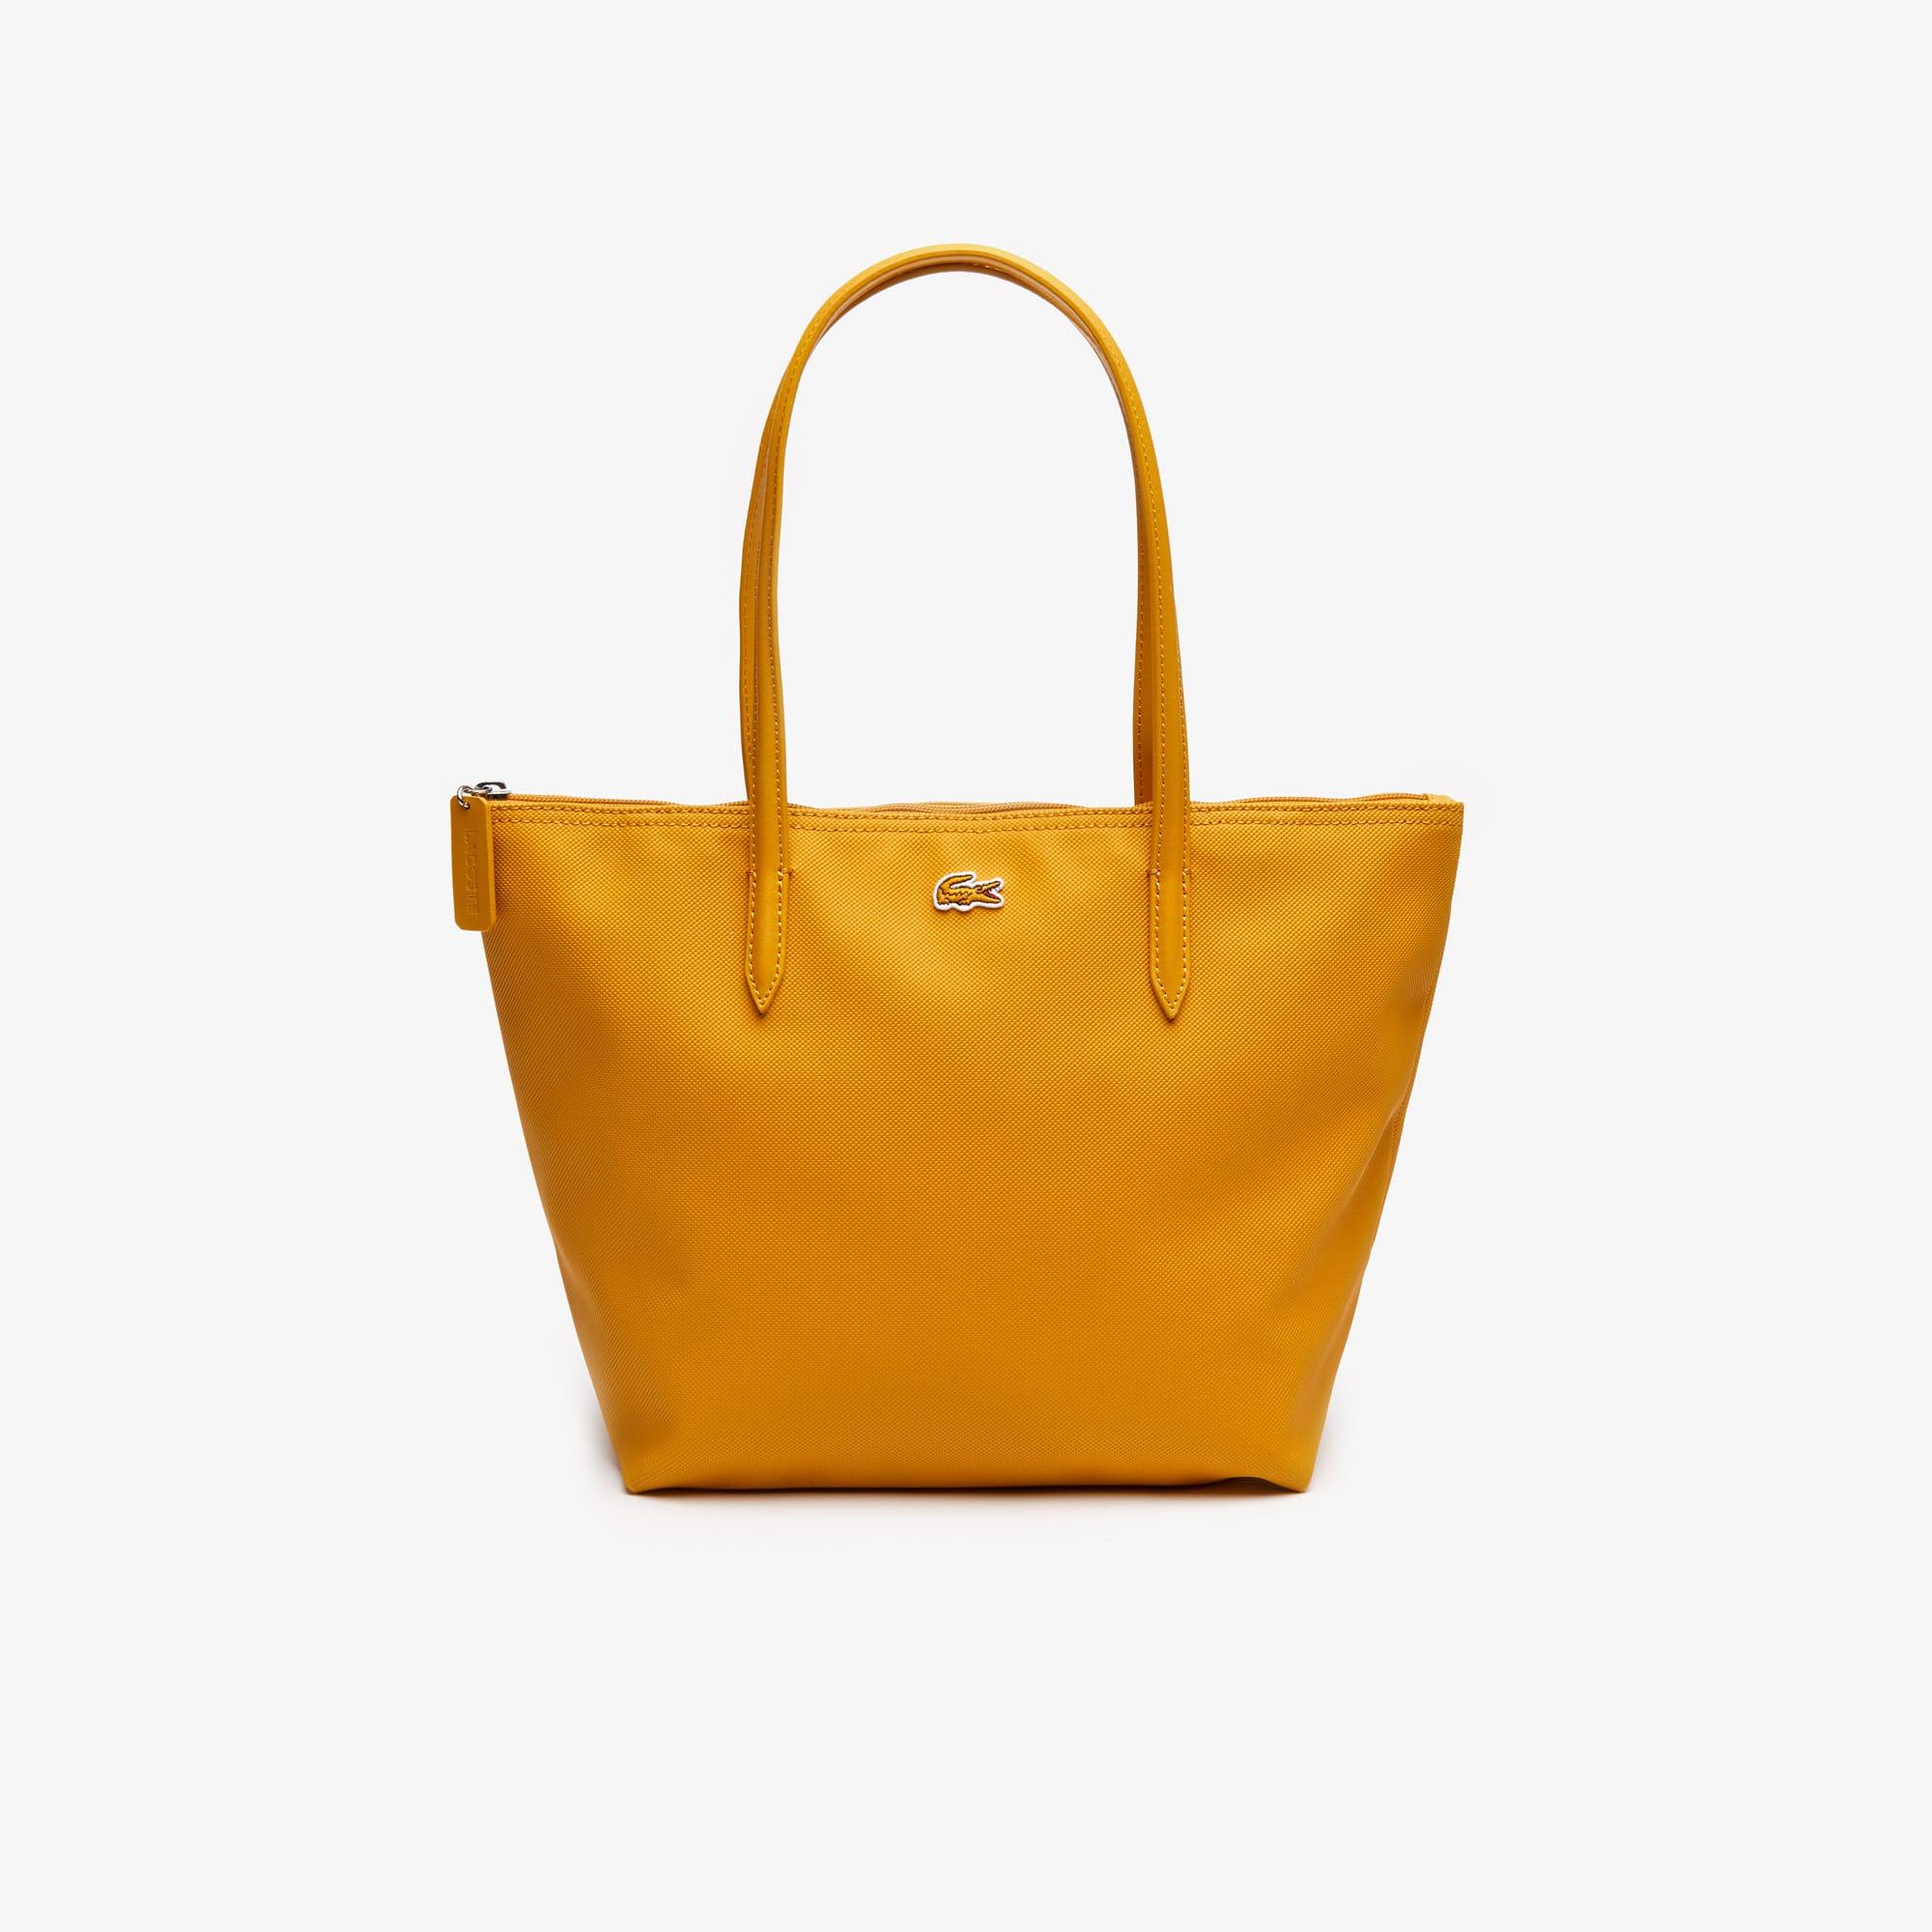 18b3969c39 Women's L.12.12 Concept Small Zip Tote Bag